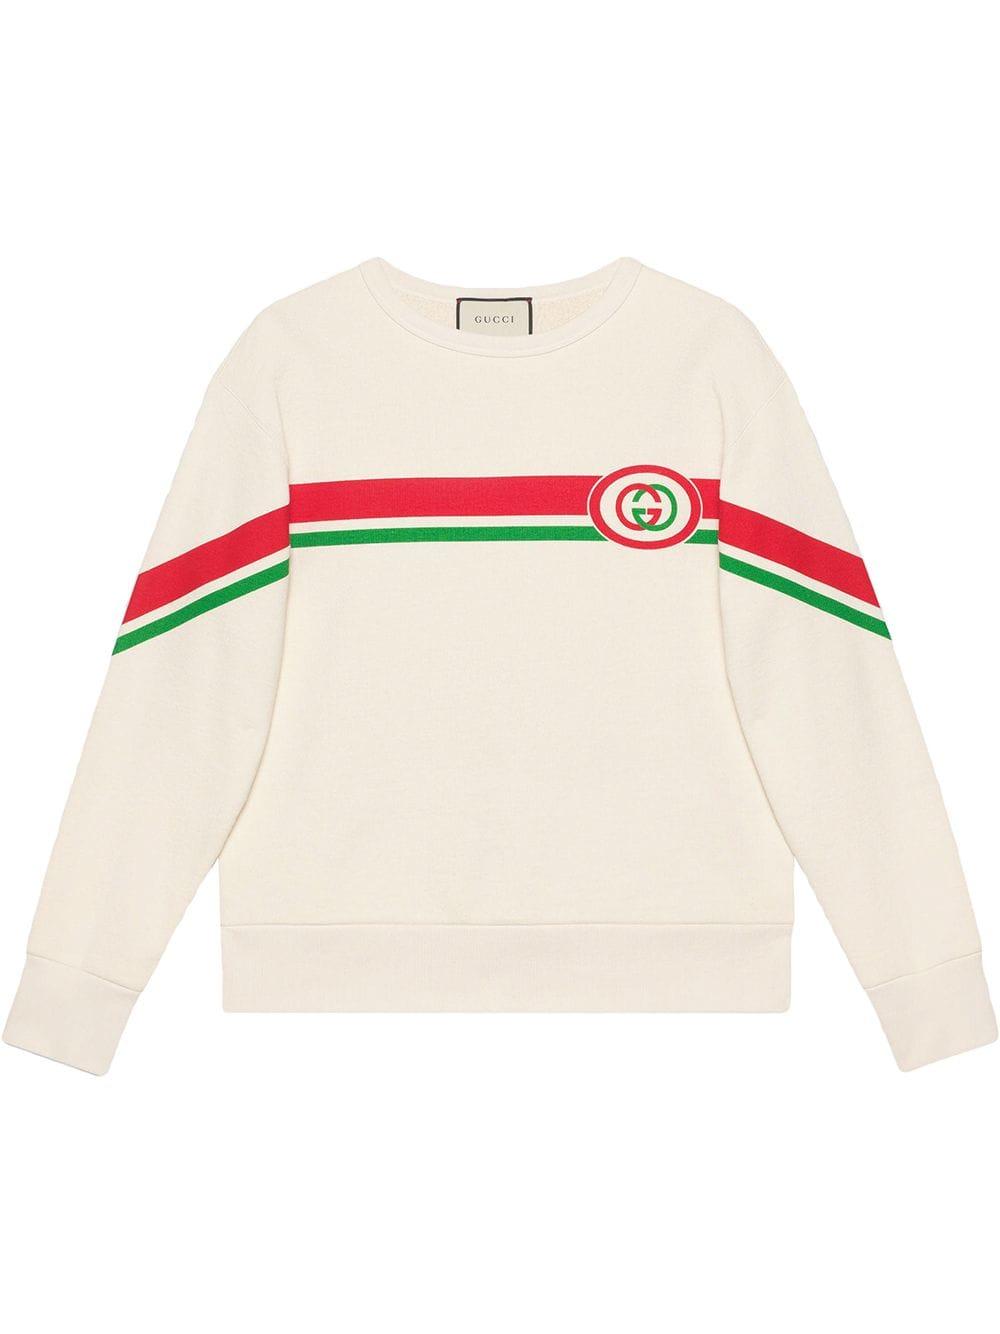 Pin By Francesca Toledo On Marcas In 2021 Cotton Sweatshirts Printed Sweatshirts Gucci Sweatshirt [ 1334 x 1000 Pixel ]